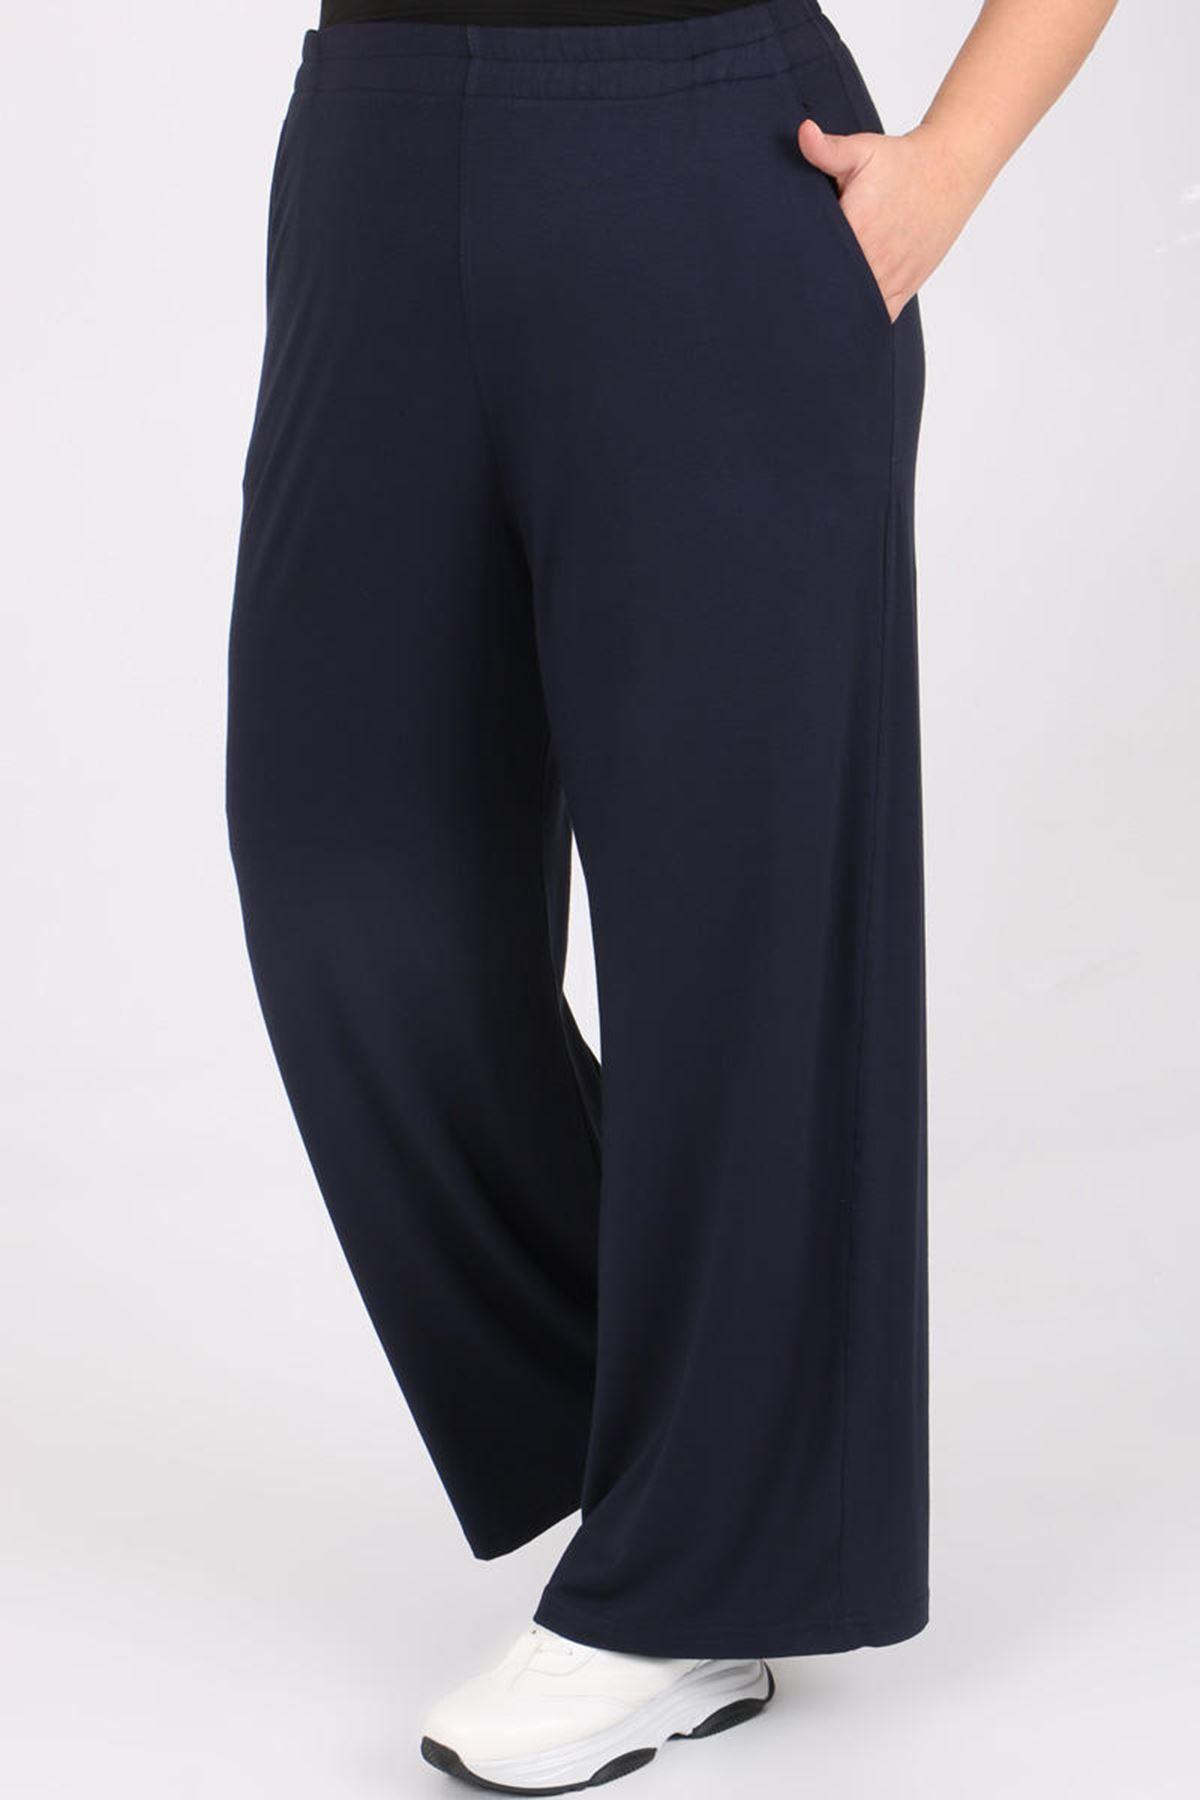 9012 Plus Size Elastic Waist Pants - Navy blue